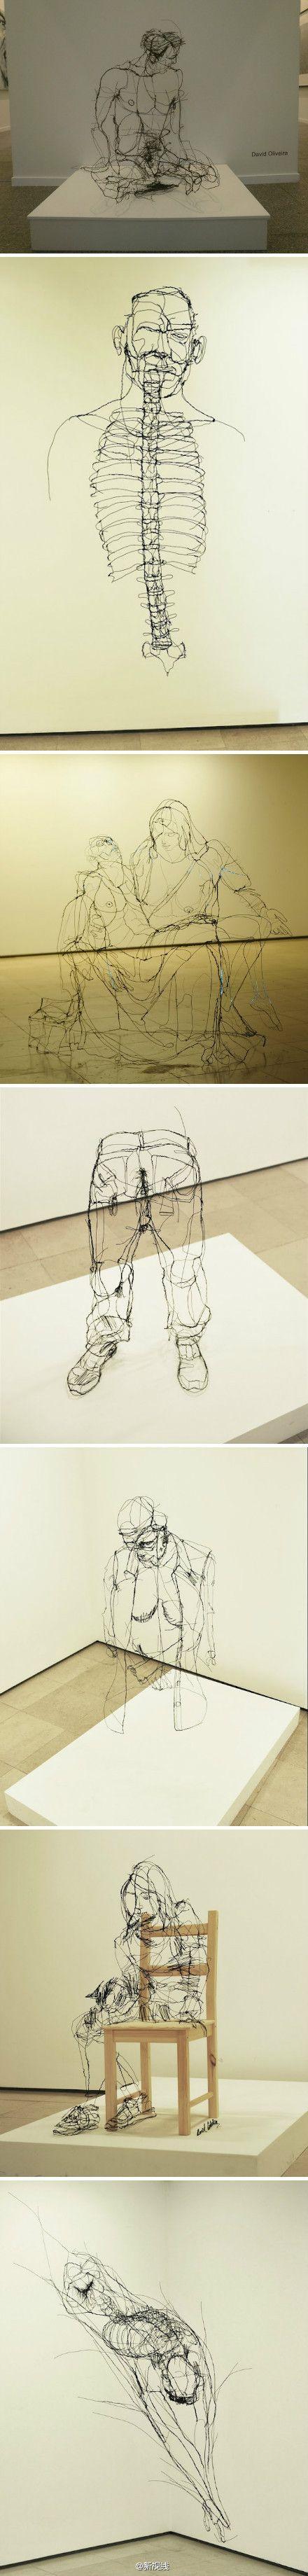 David Oliveira // Sculptures // Iron String...awesome pieces